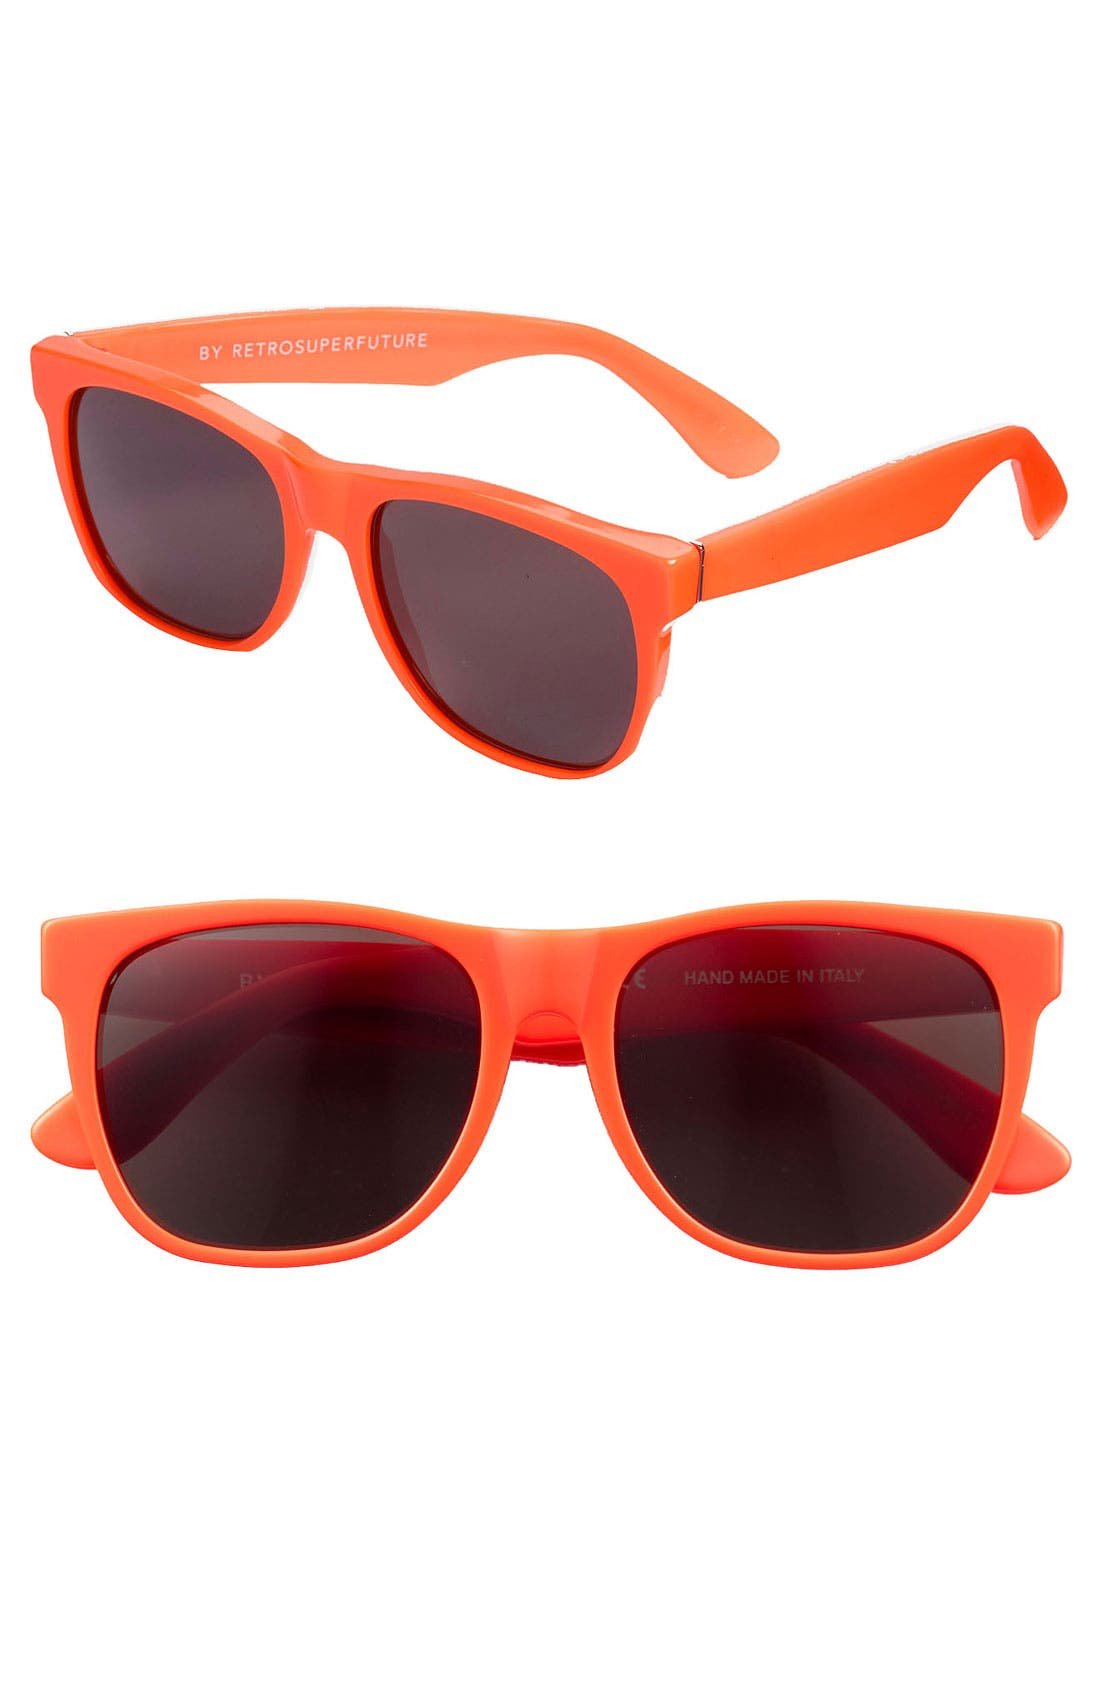 Alternate Image 1 Selected - SUPER by RETROSUPERFUTURE® 'Classic' 55mm Sunglasses